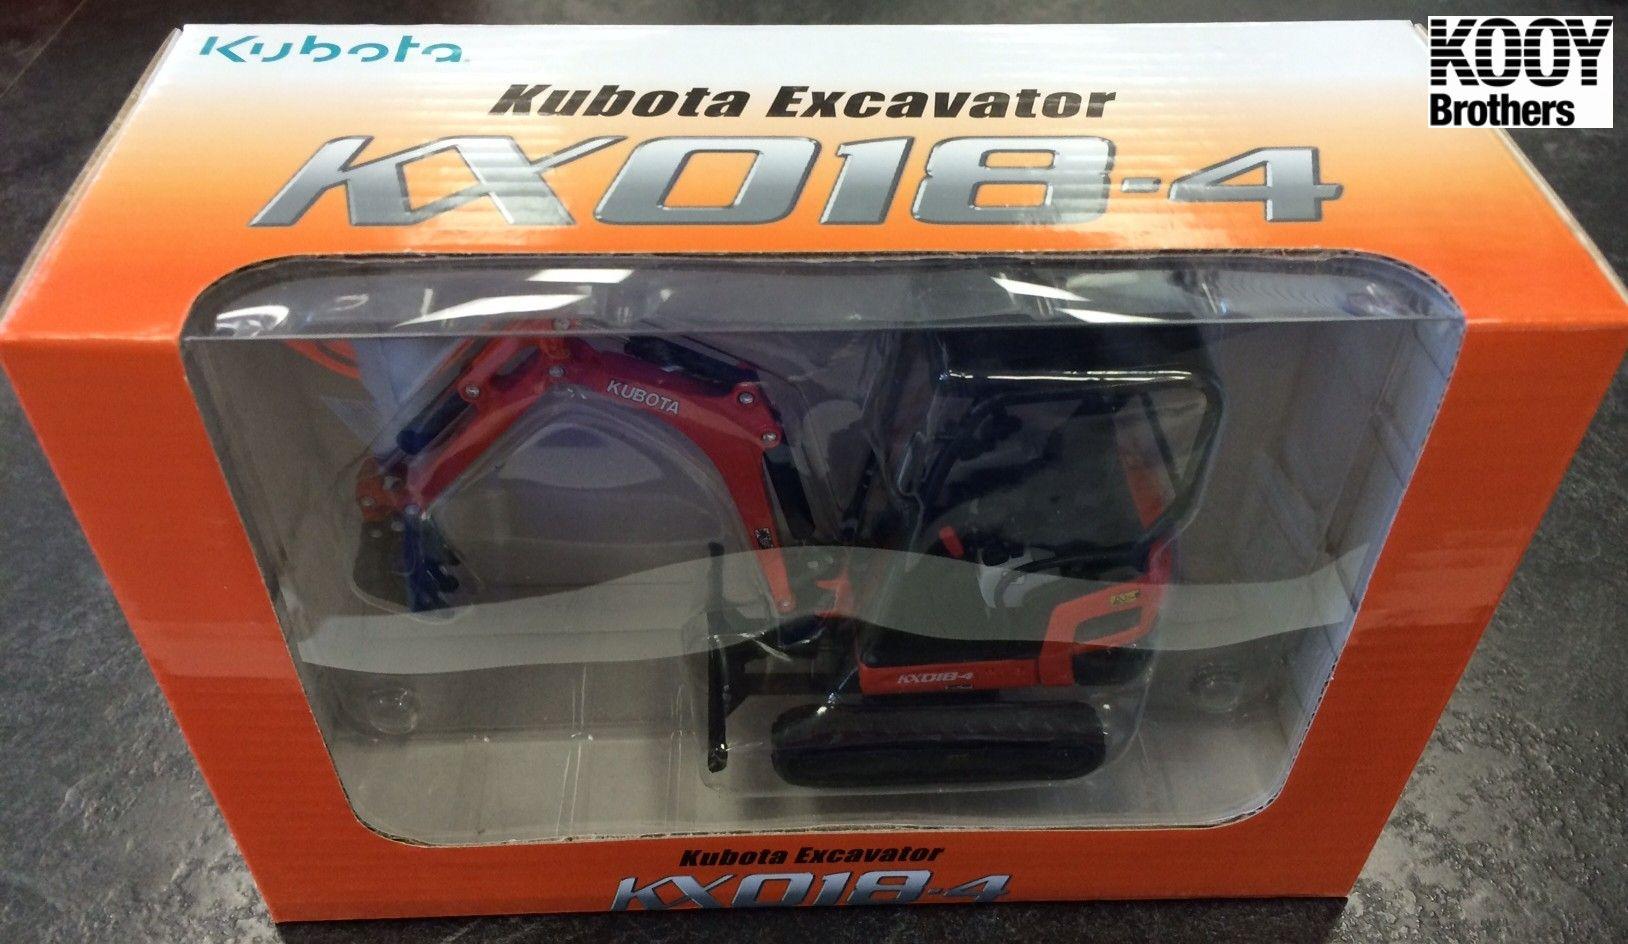 Kubota DieCast Collector Toy Excavator Model KX018-4